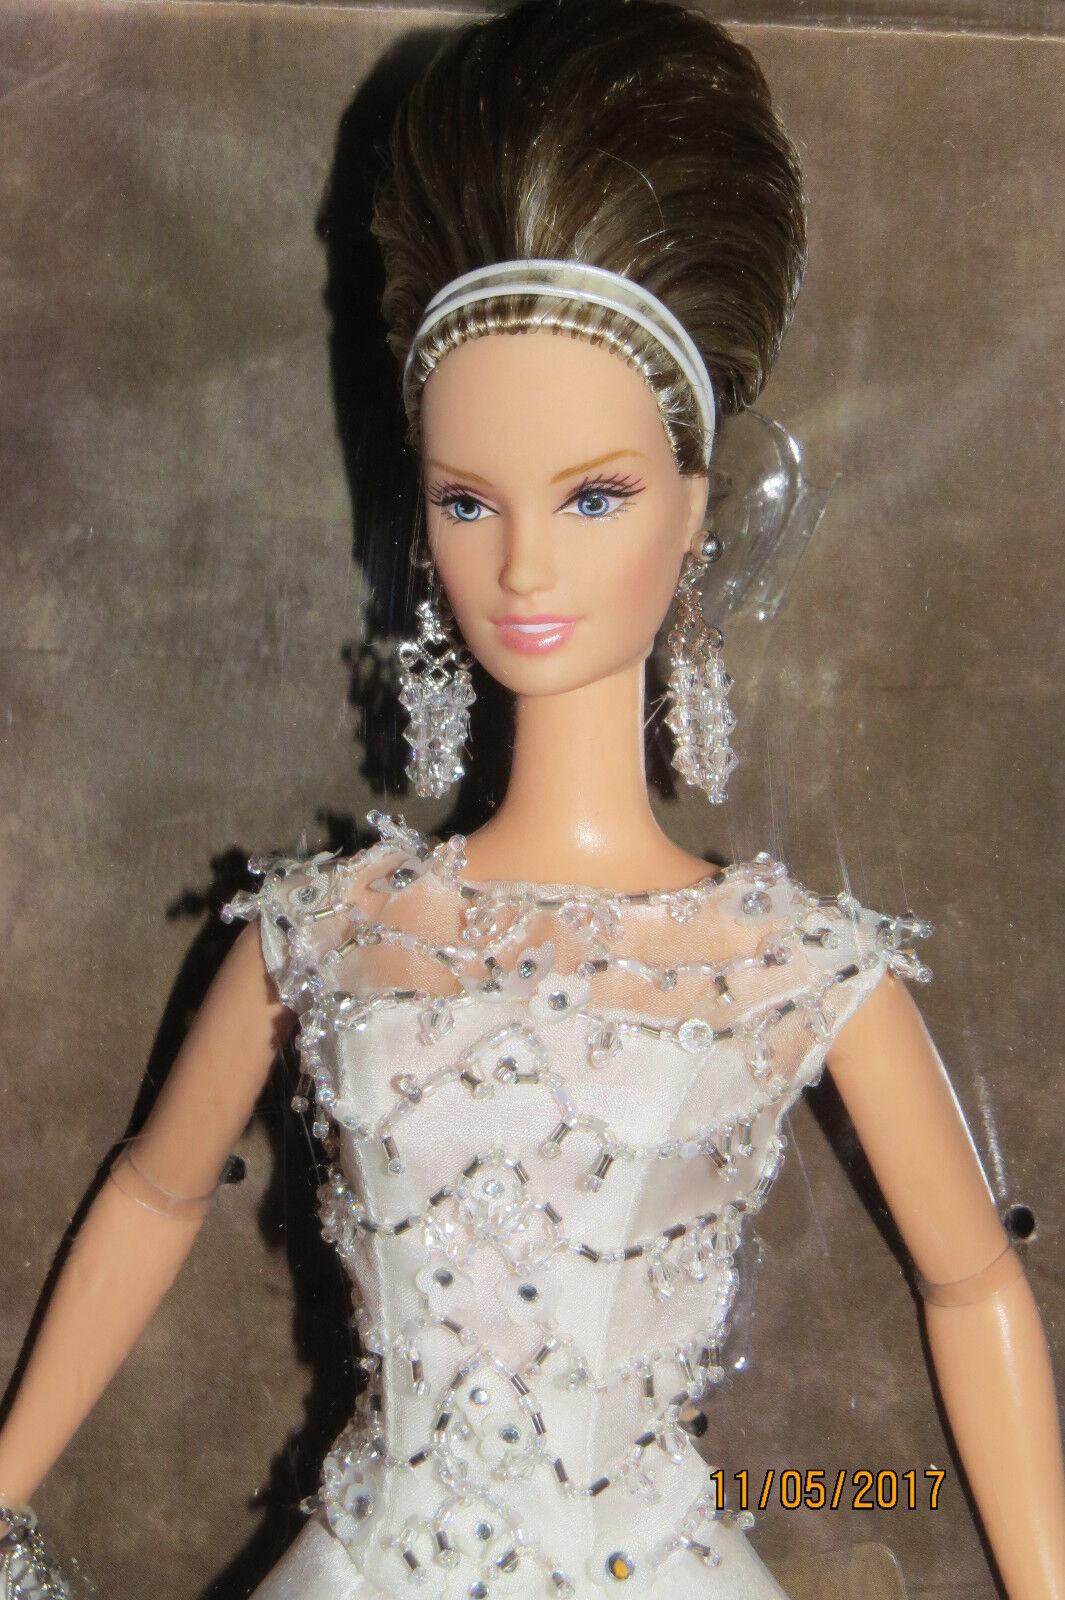 NRFB BARBIE BADGLEY & MISCHKA BRIDE Mariée collection collector B8946 oro label